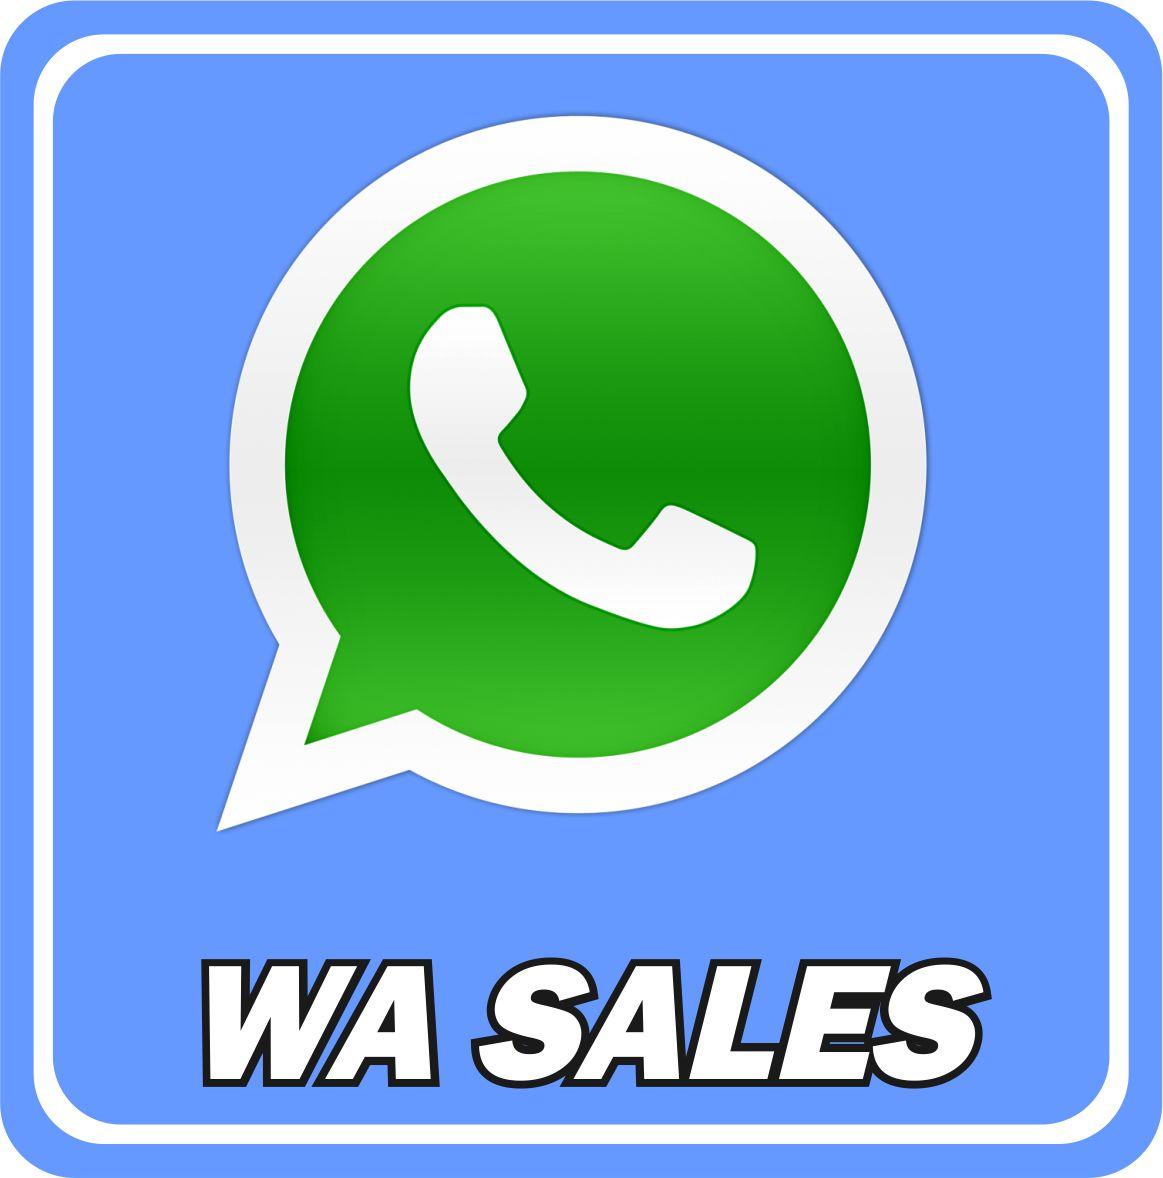 grand new avanza olx jateng gambar veloz 1.3 daftar harga mobil toyota pati dealer nasmoco